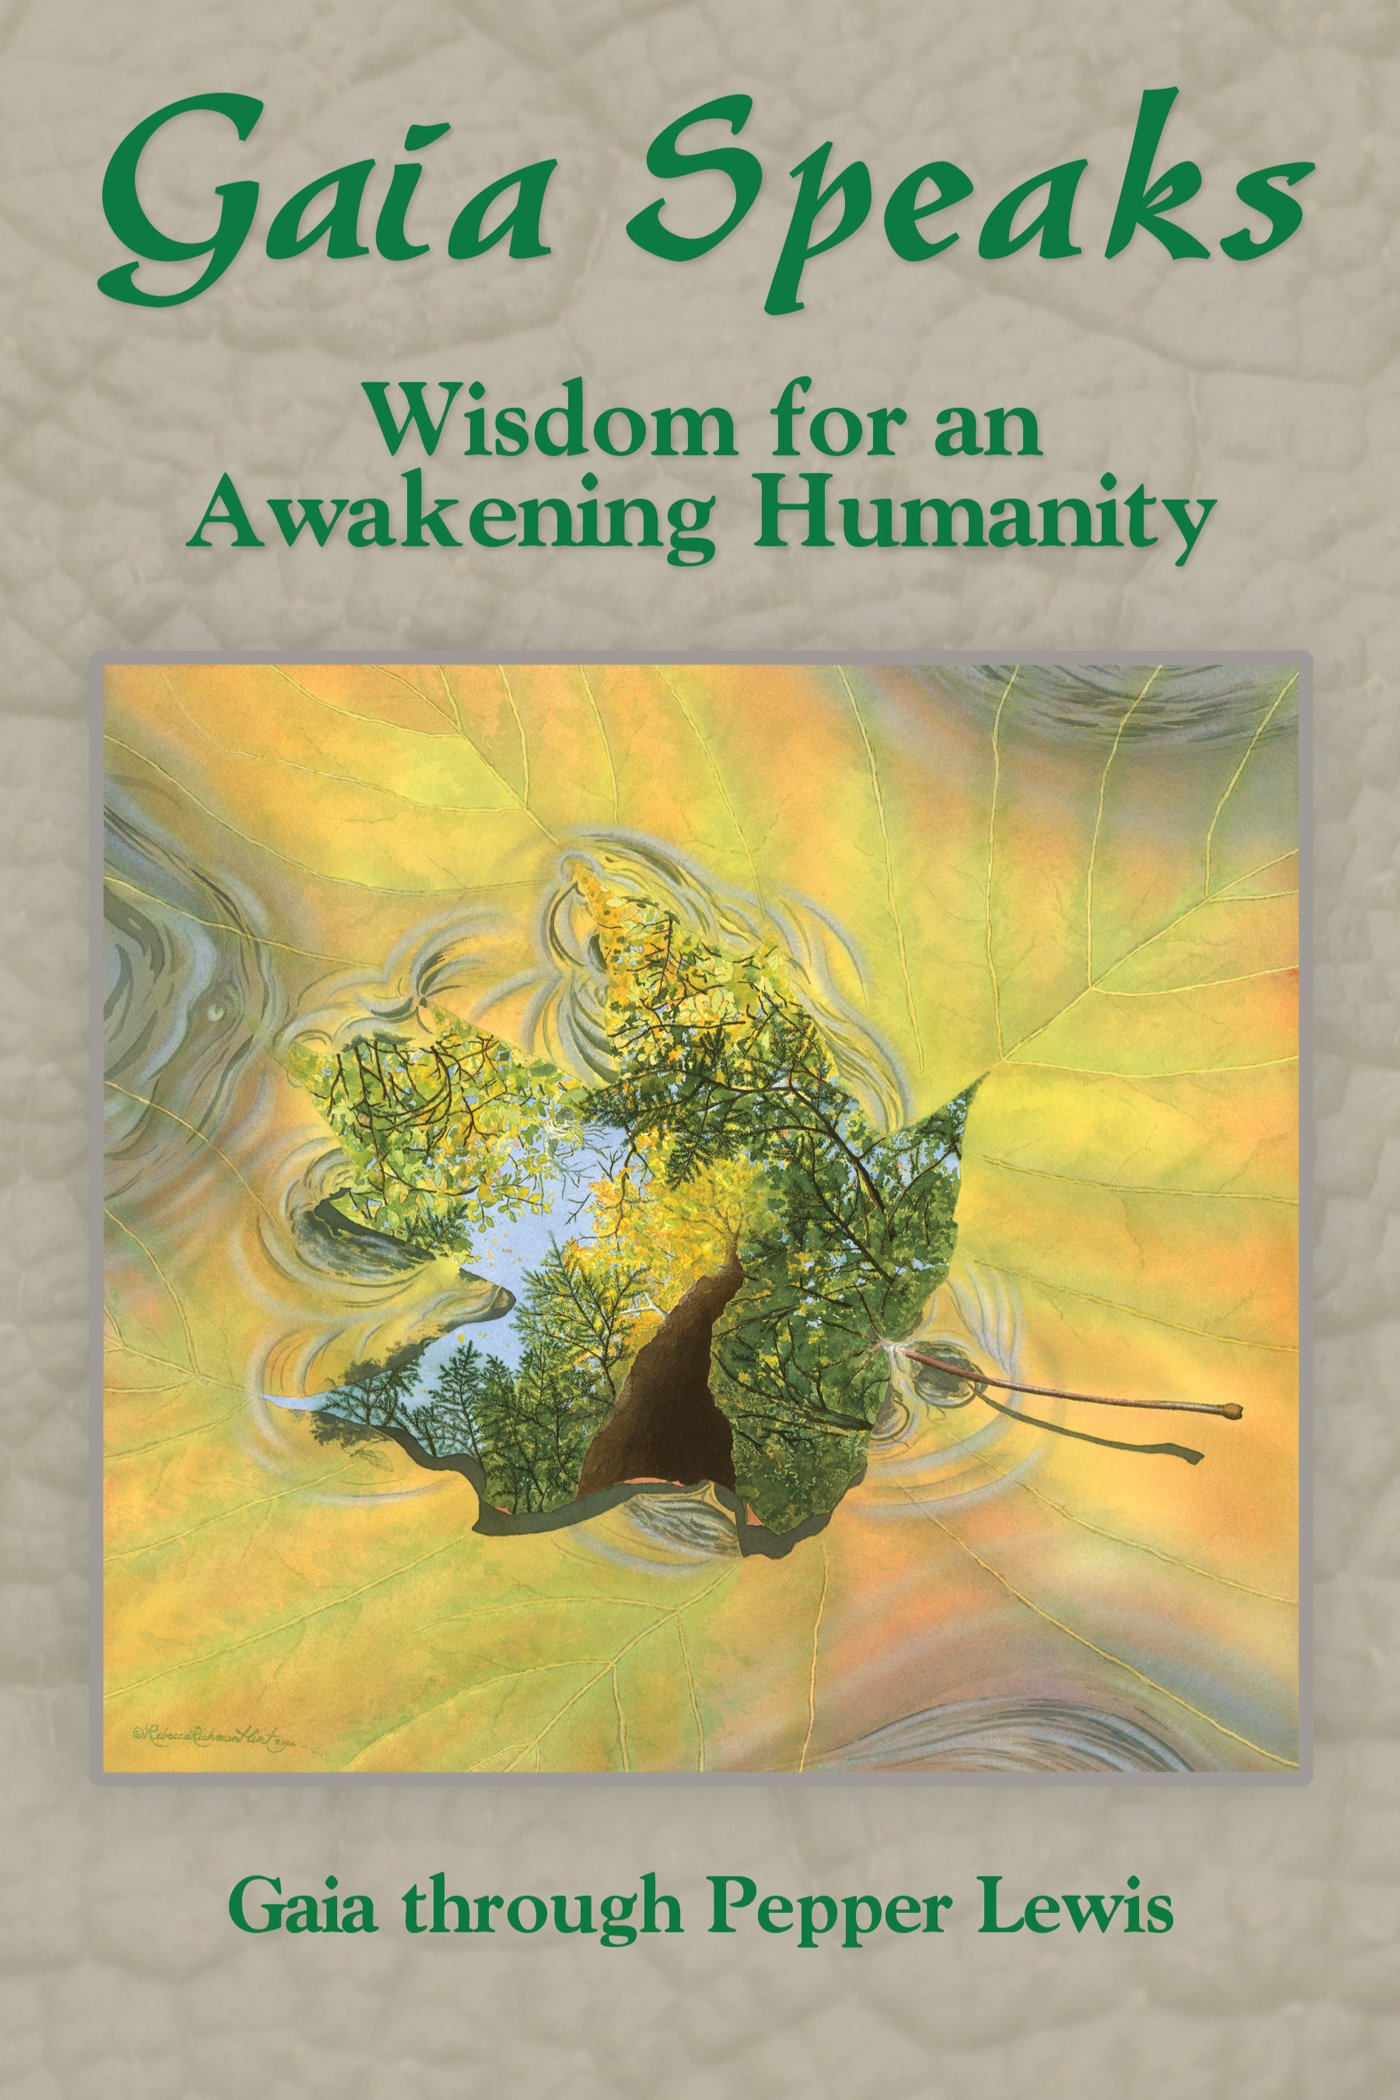 Gaia Speaks: Wisdom for an Awakening Humanity (Gaia Speaks Series, Book 2)